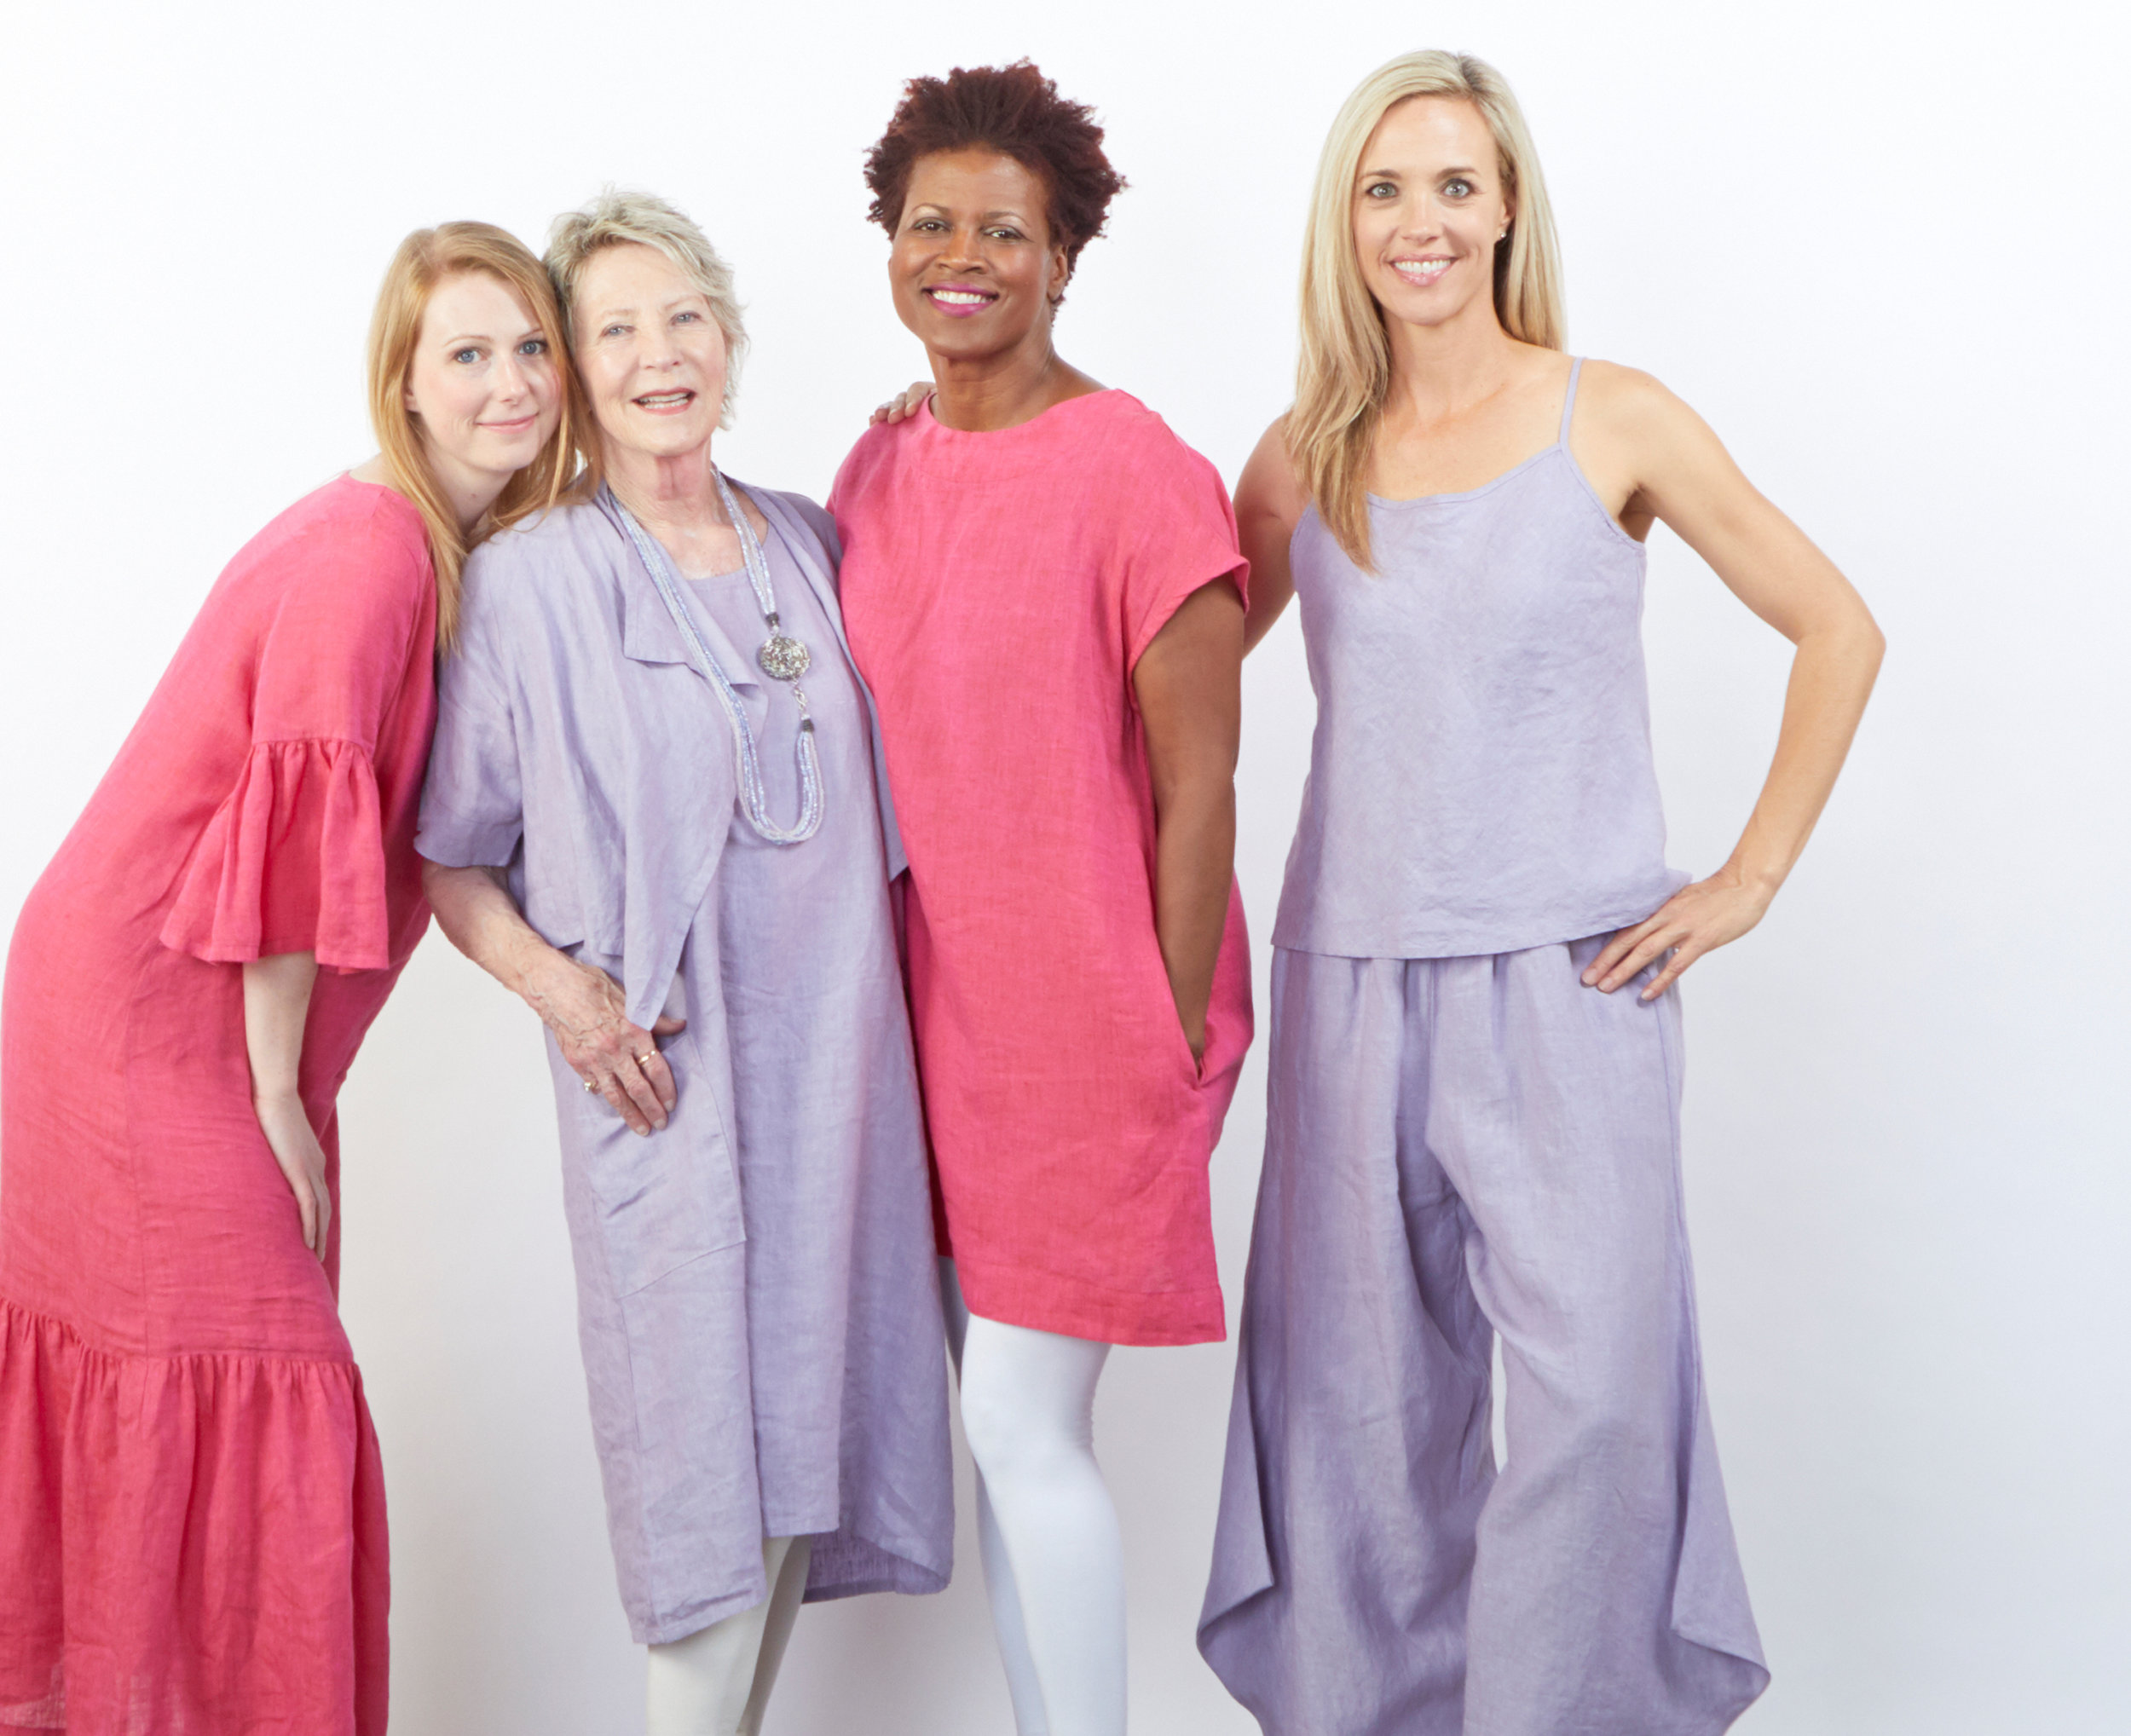 Seraphina Dress, Ansel Tunic in Anacapri, Malin Jacket, Luella Dress, Lucy Tank, Seamus Pant in Pienza Cross Dyed Linen